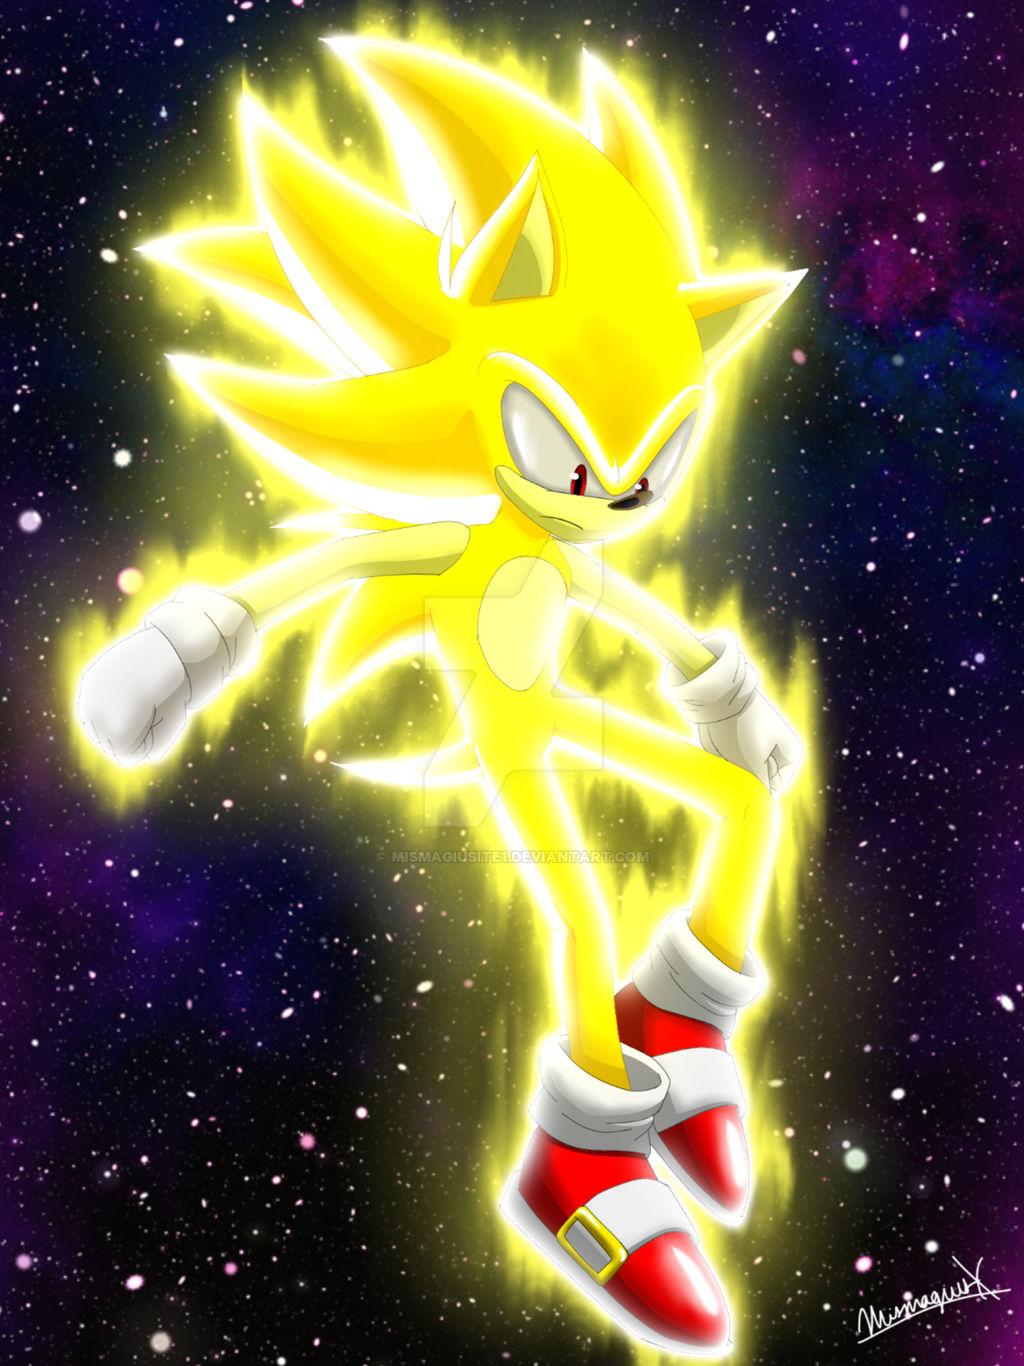 Super Sonic By Mismagiusite1 On Deviantart